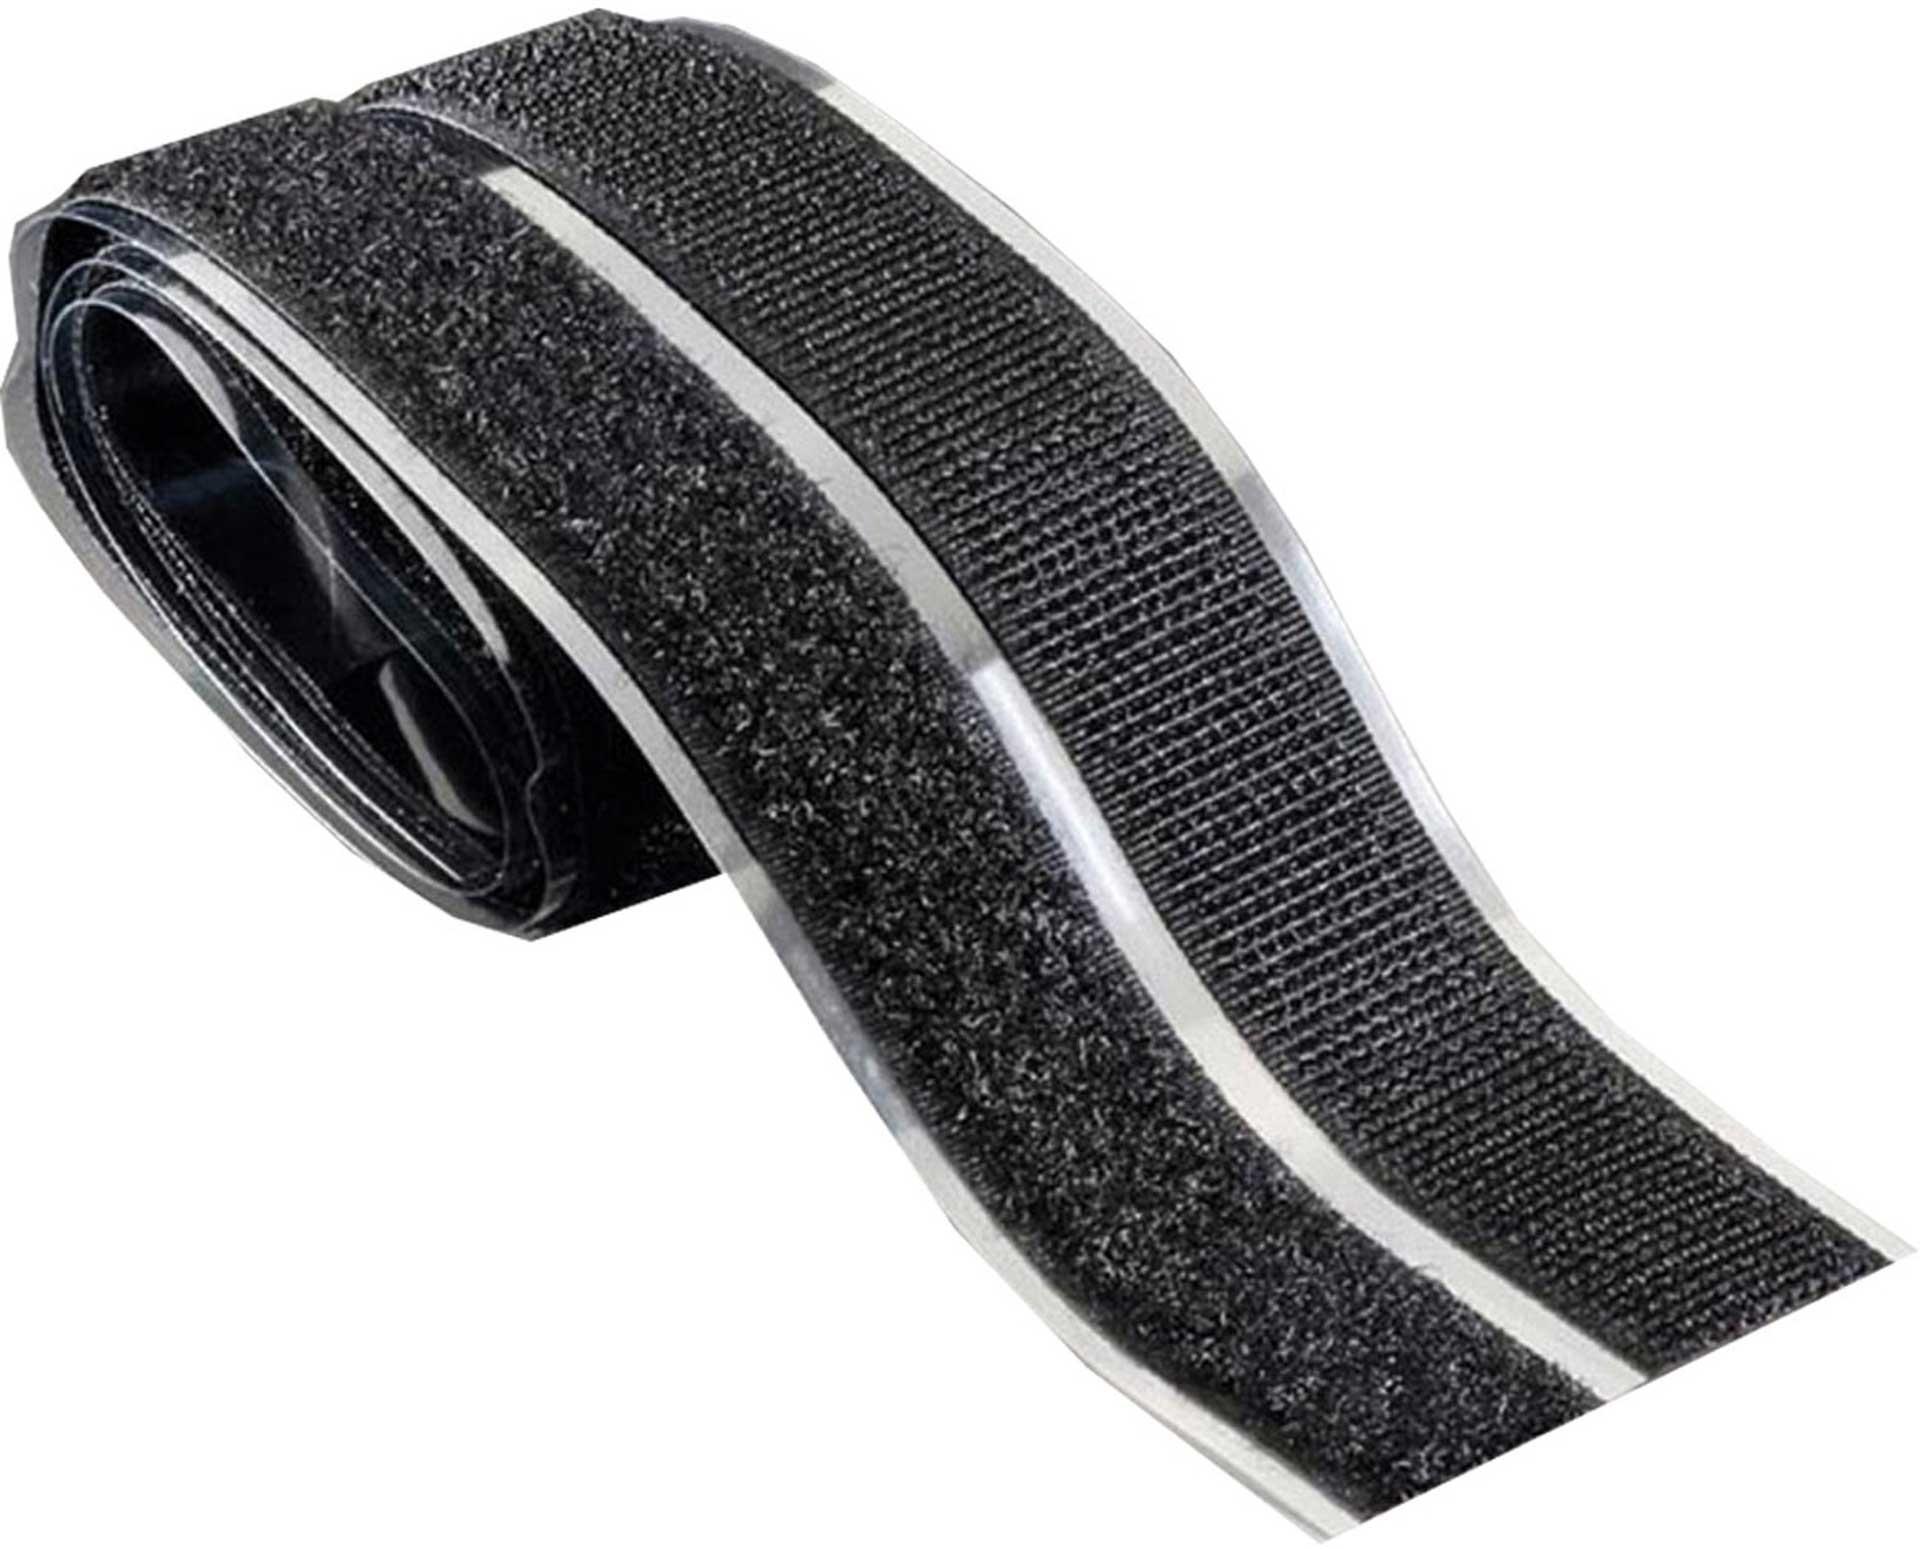 ROBBE Hook and loop (Velcro) 3M self adhesive 20X1000 MM